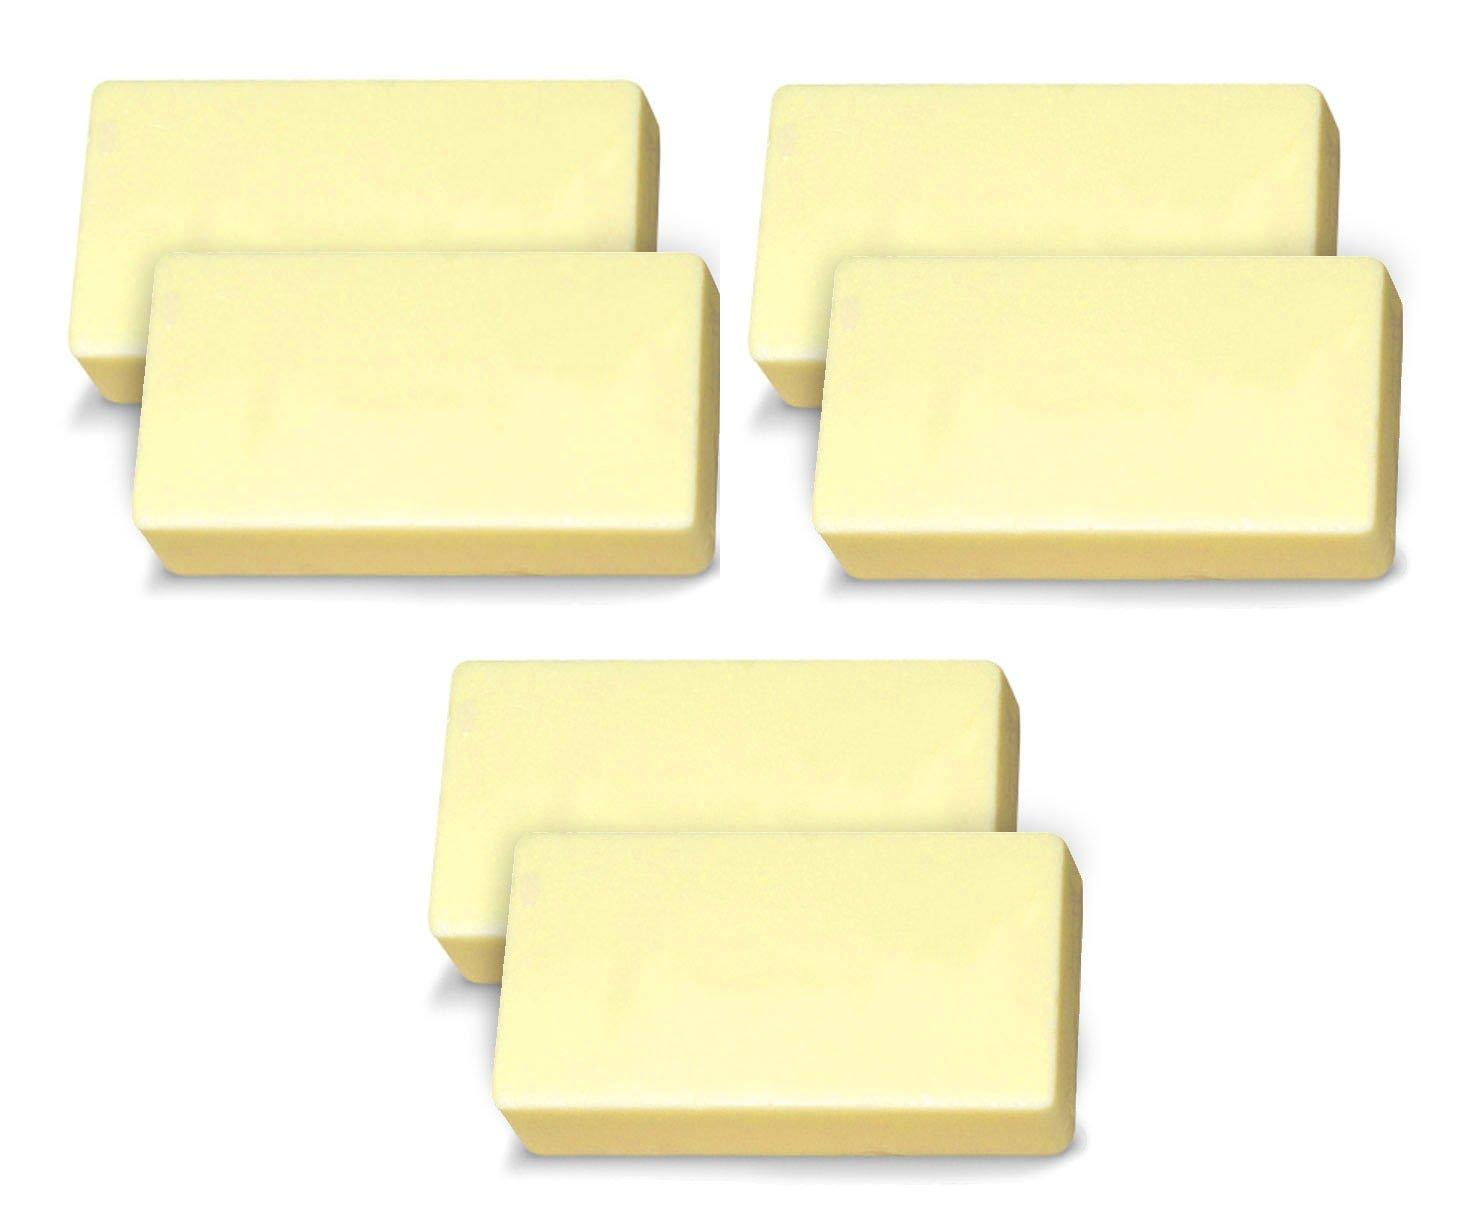 Premium Sulfur Lavender Soap   10% Sulfur Advanced Cleaning Bar 4oz (6-4oz Bars)